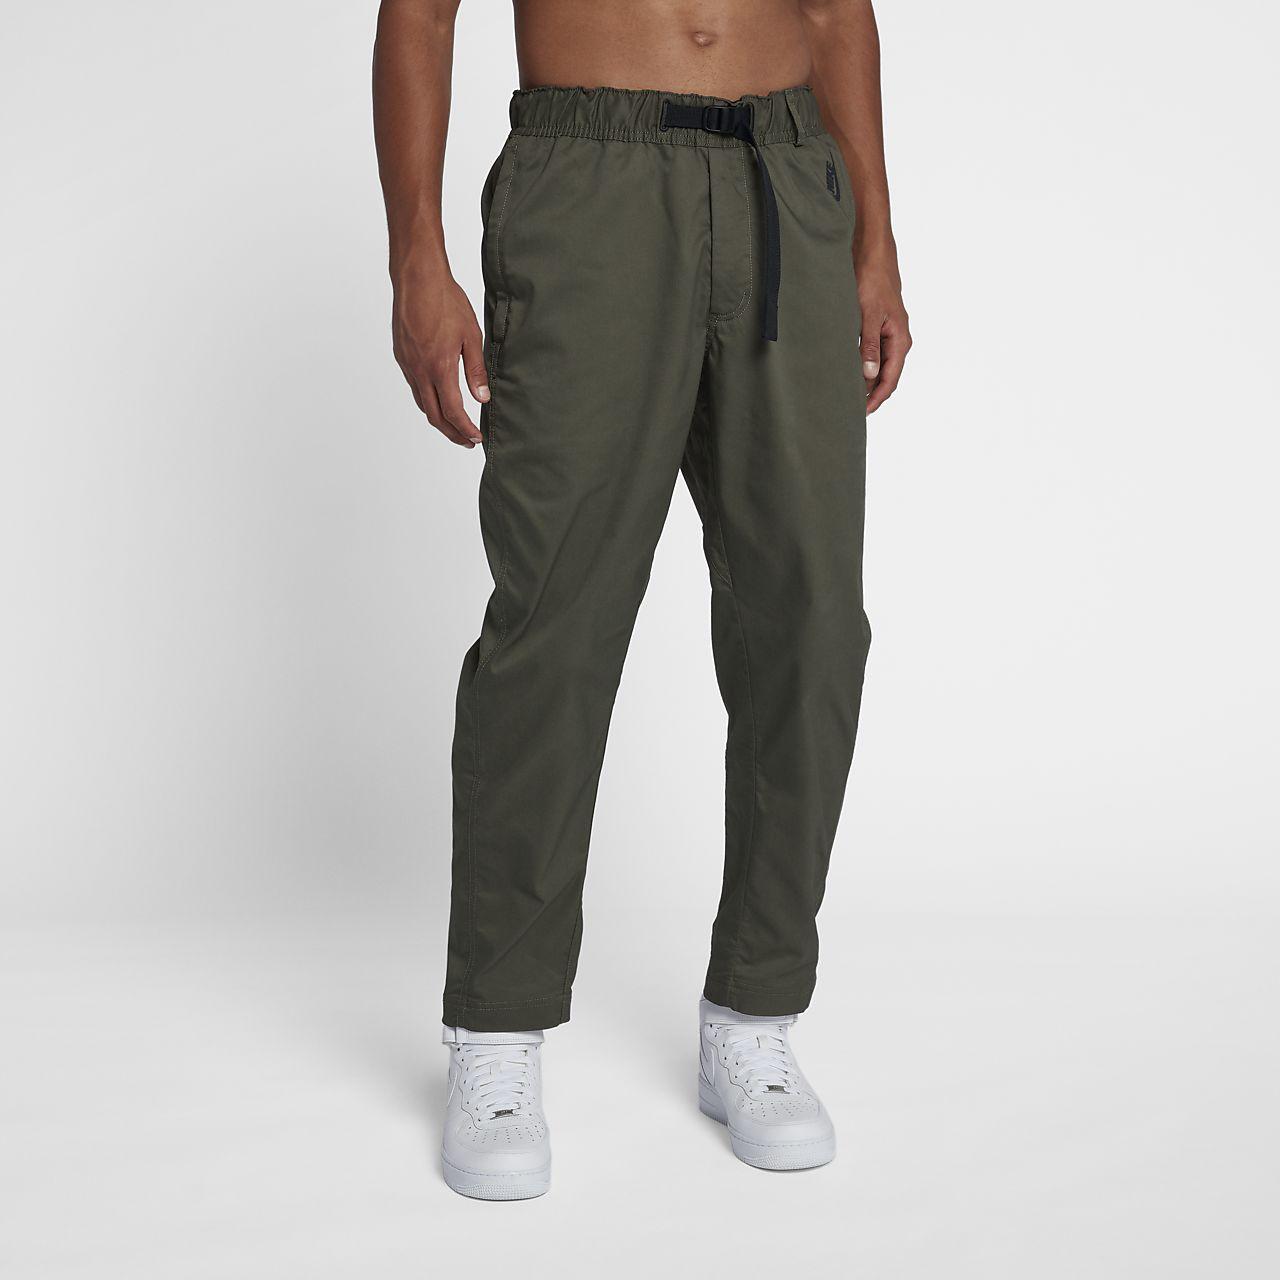 NikeLab Collection Men's Woven Pants